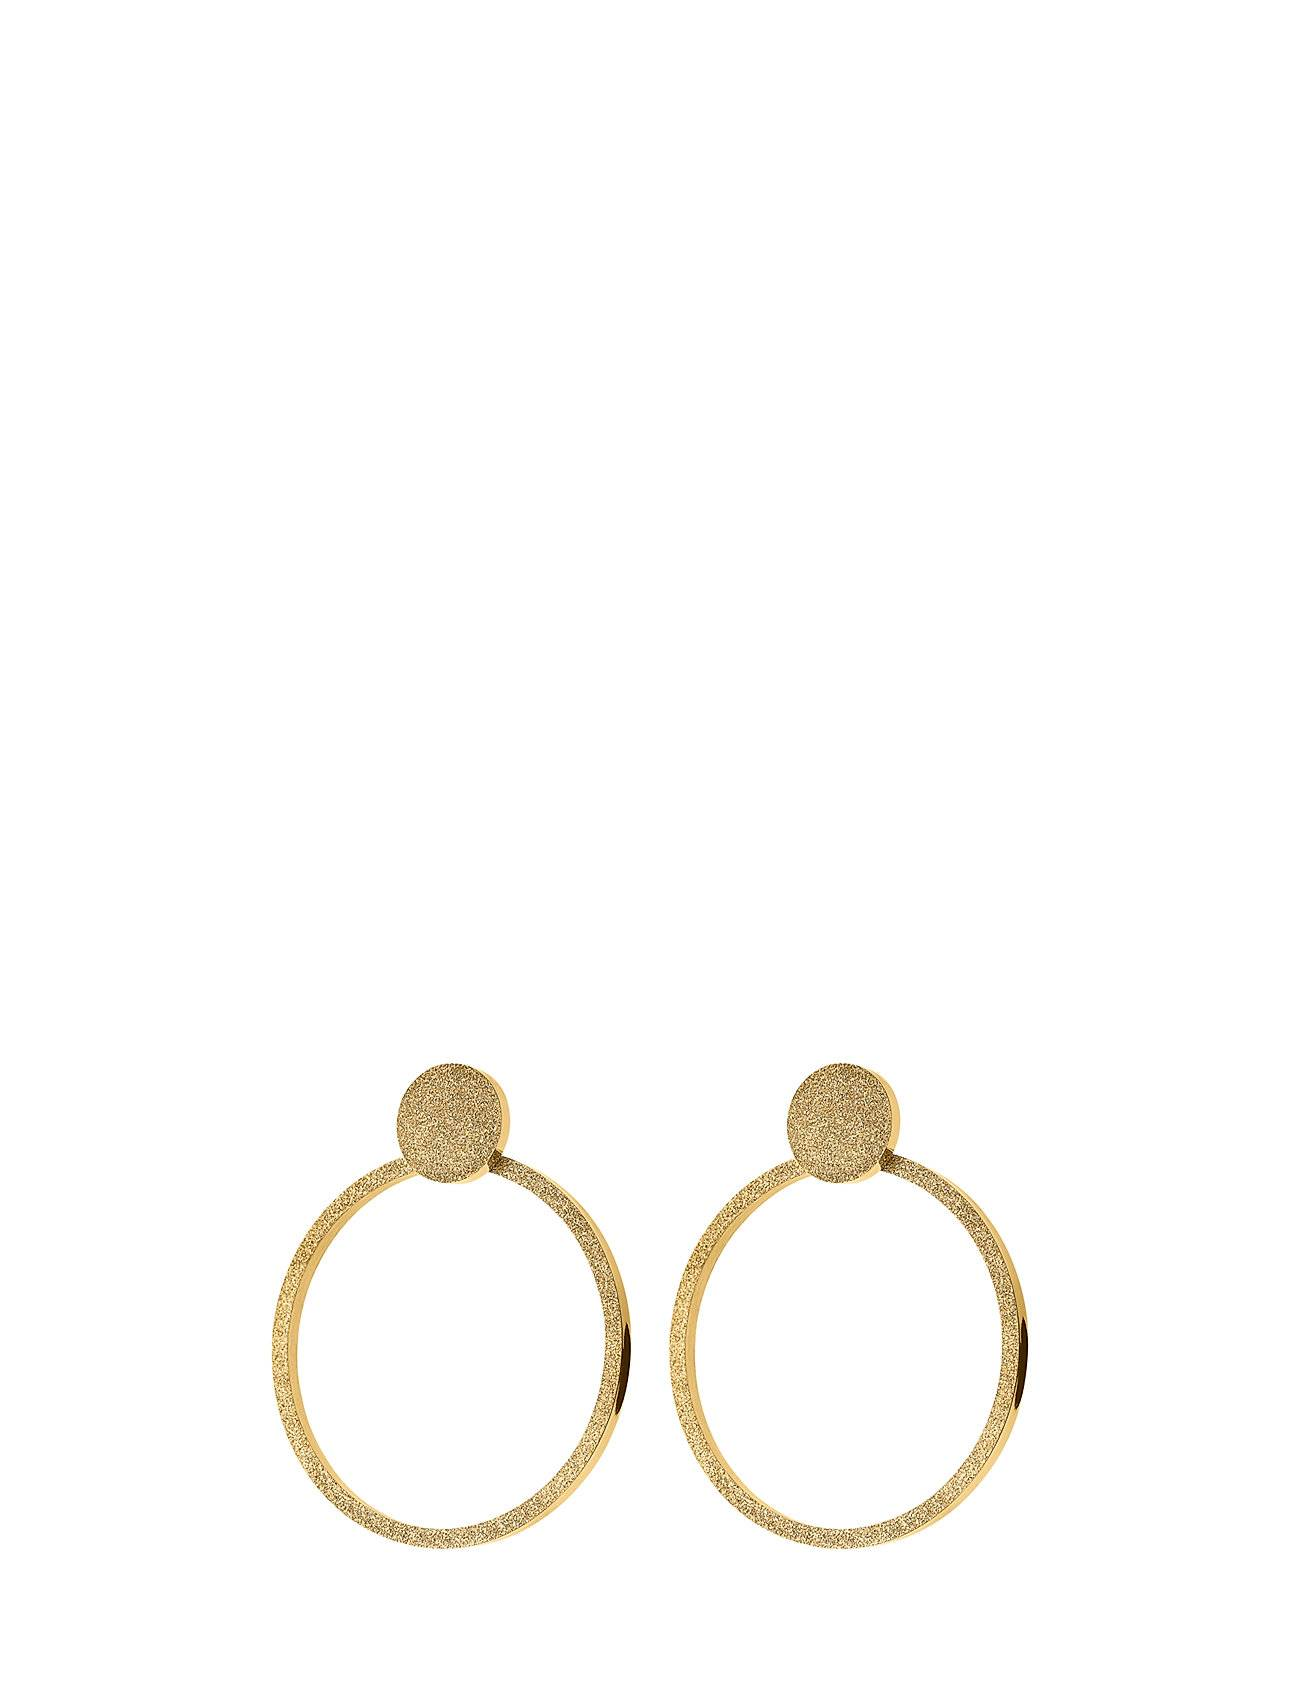 Edblad Valerie Earrings Large Sparkle Gold